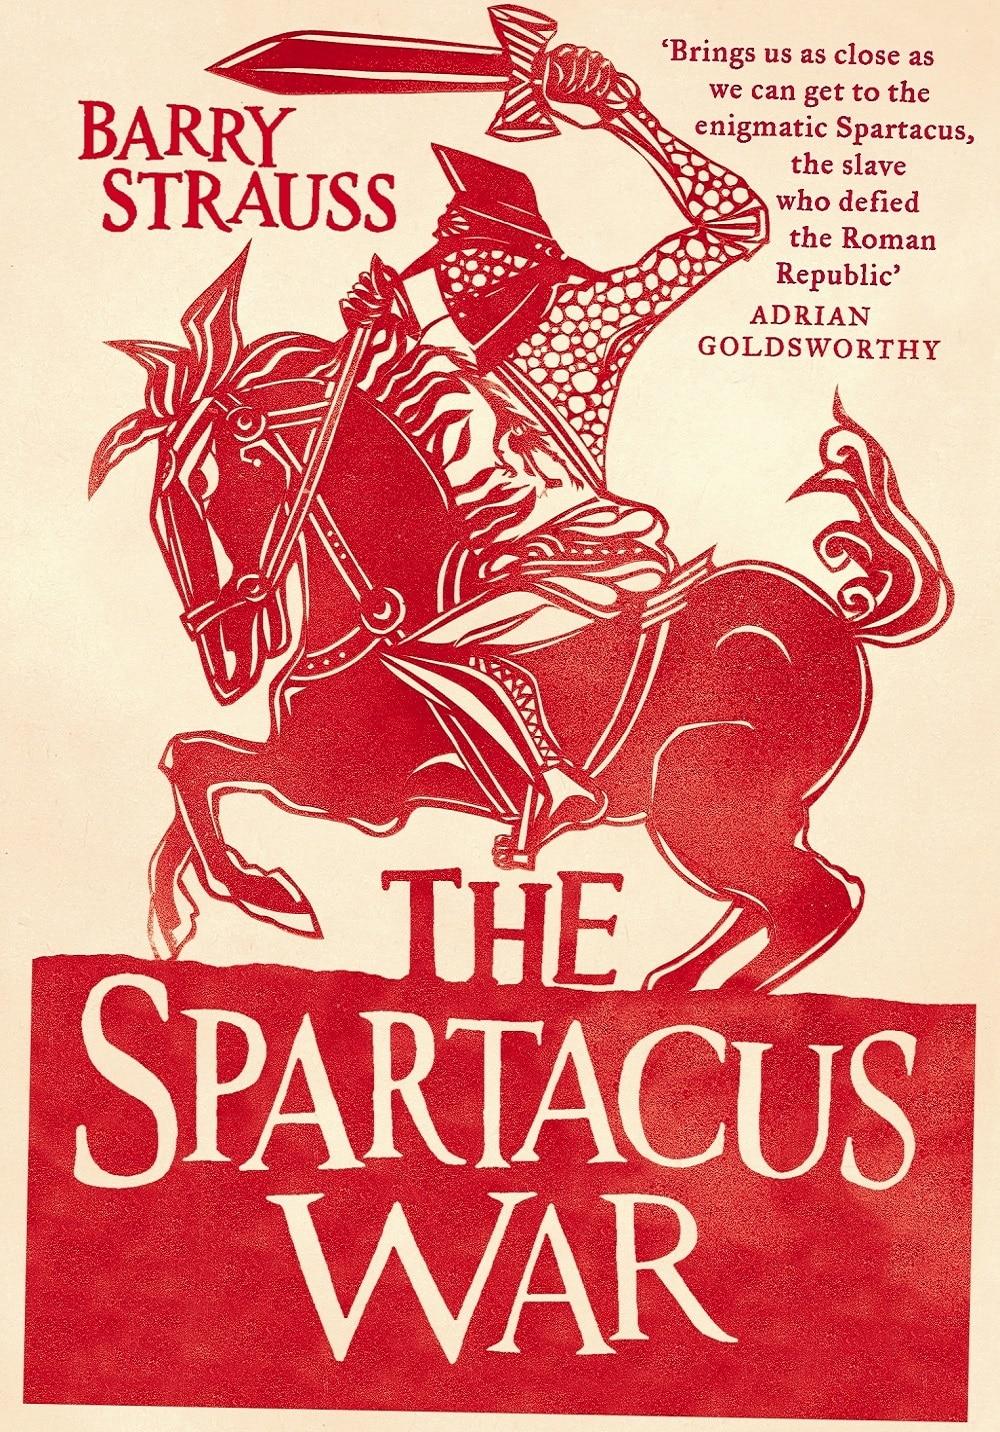 SpartacusWar-Hi-Copy